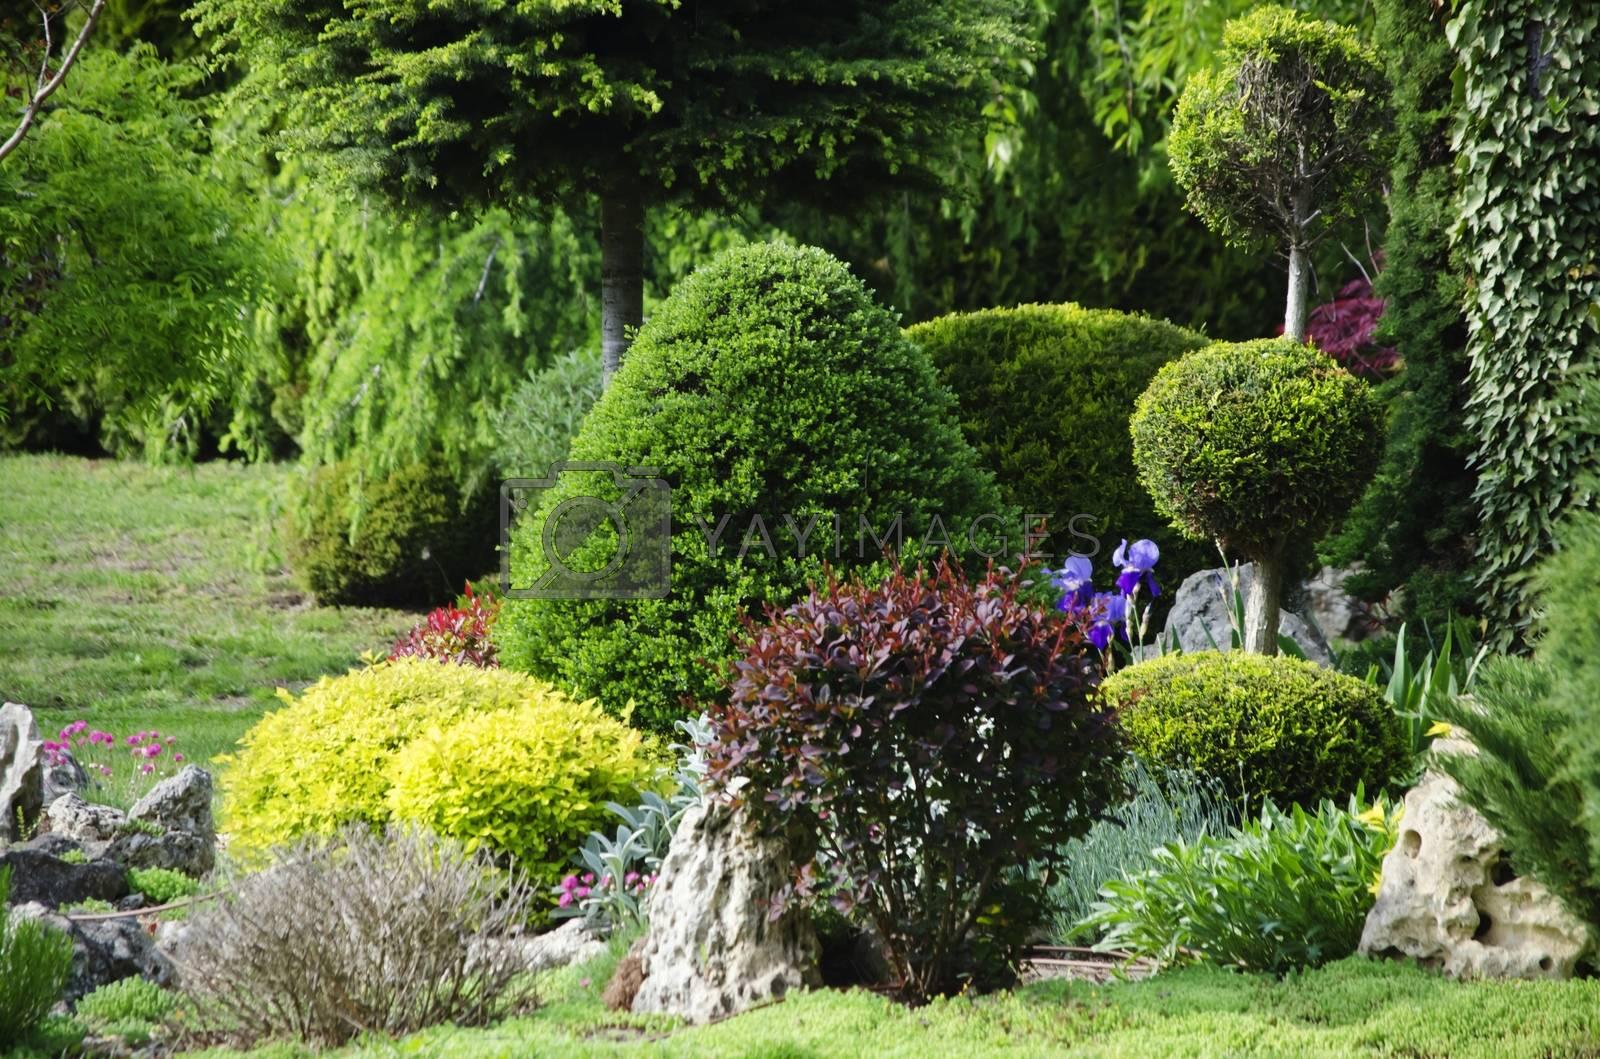 Royalty free image of Gardening and Landscaping by razvodovska